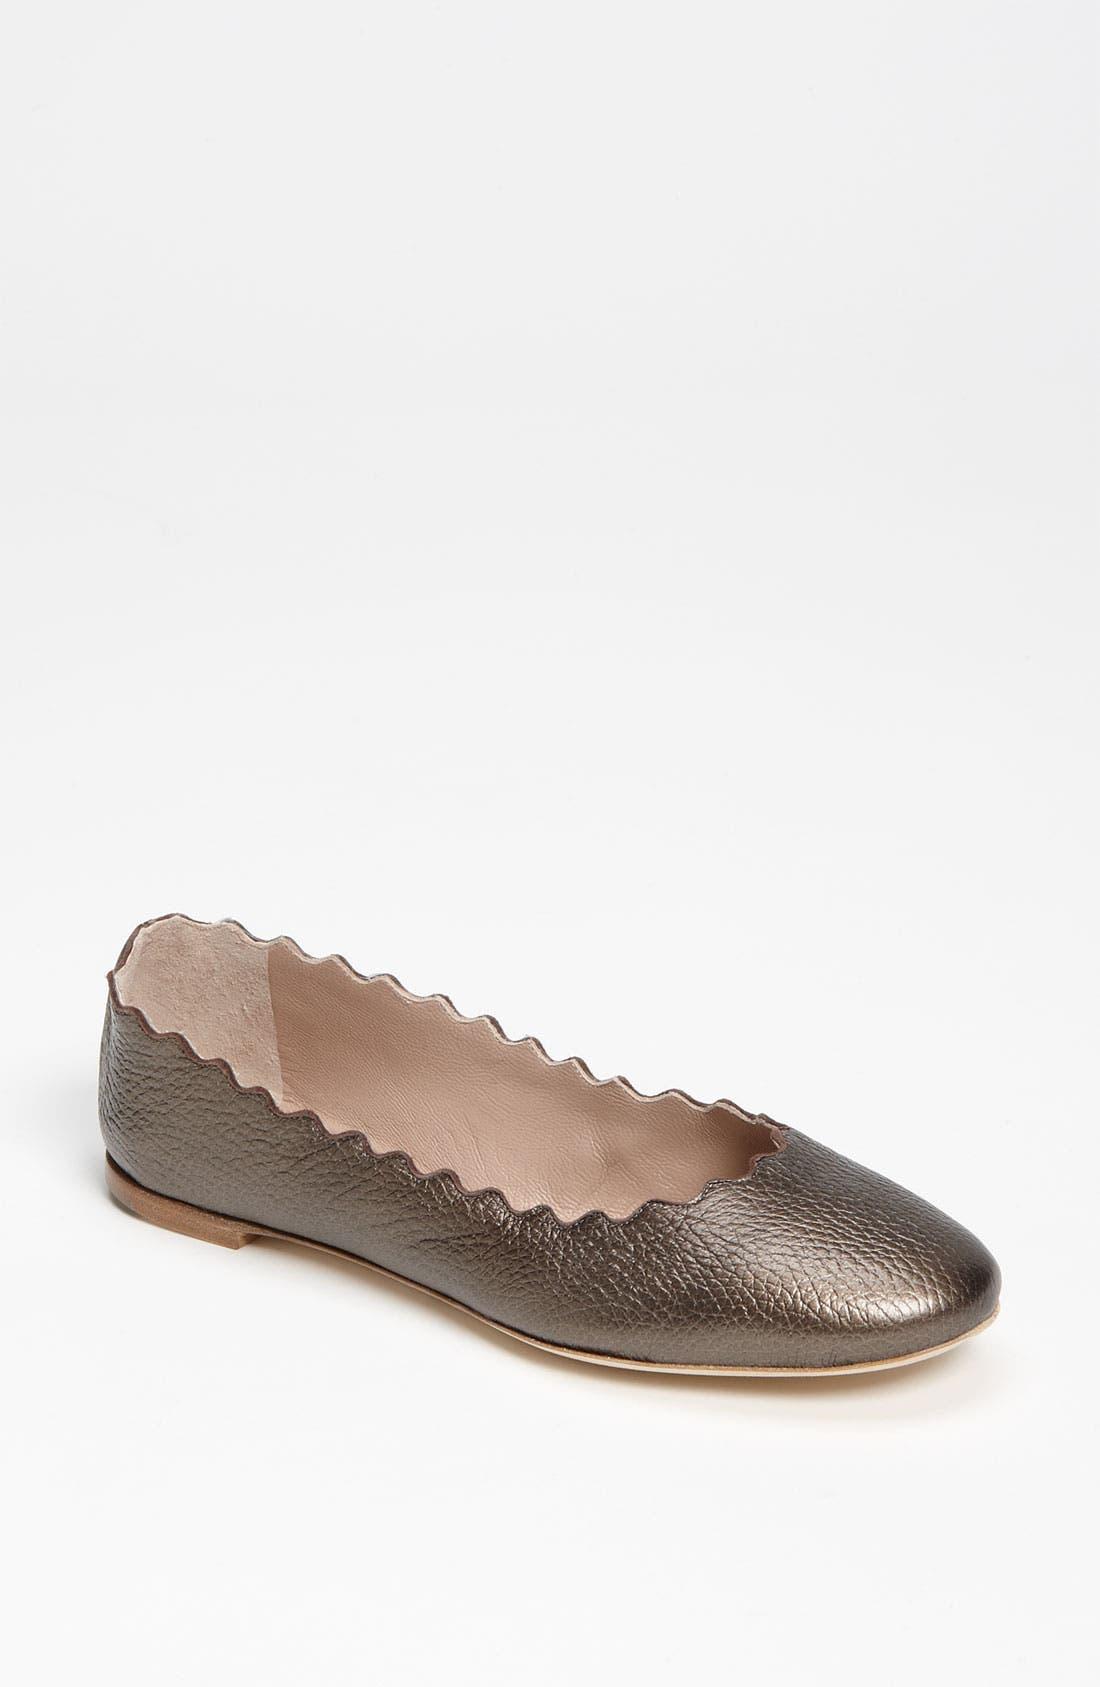 Alternate Image 1 Selected - Chloé Scalloped Ballet Flat